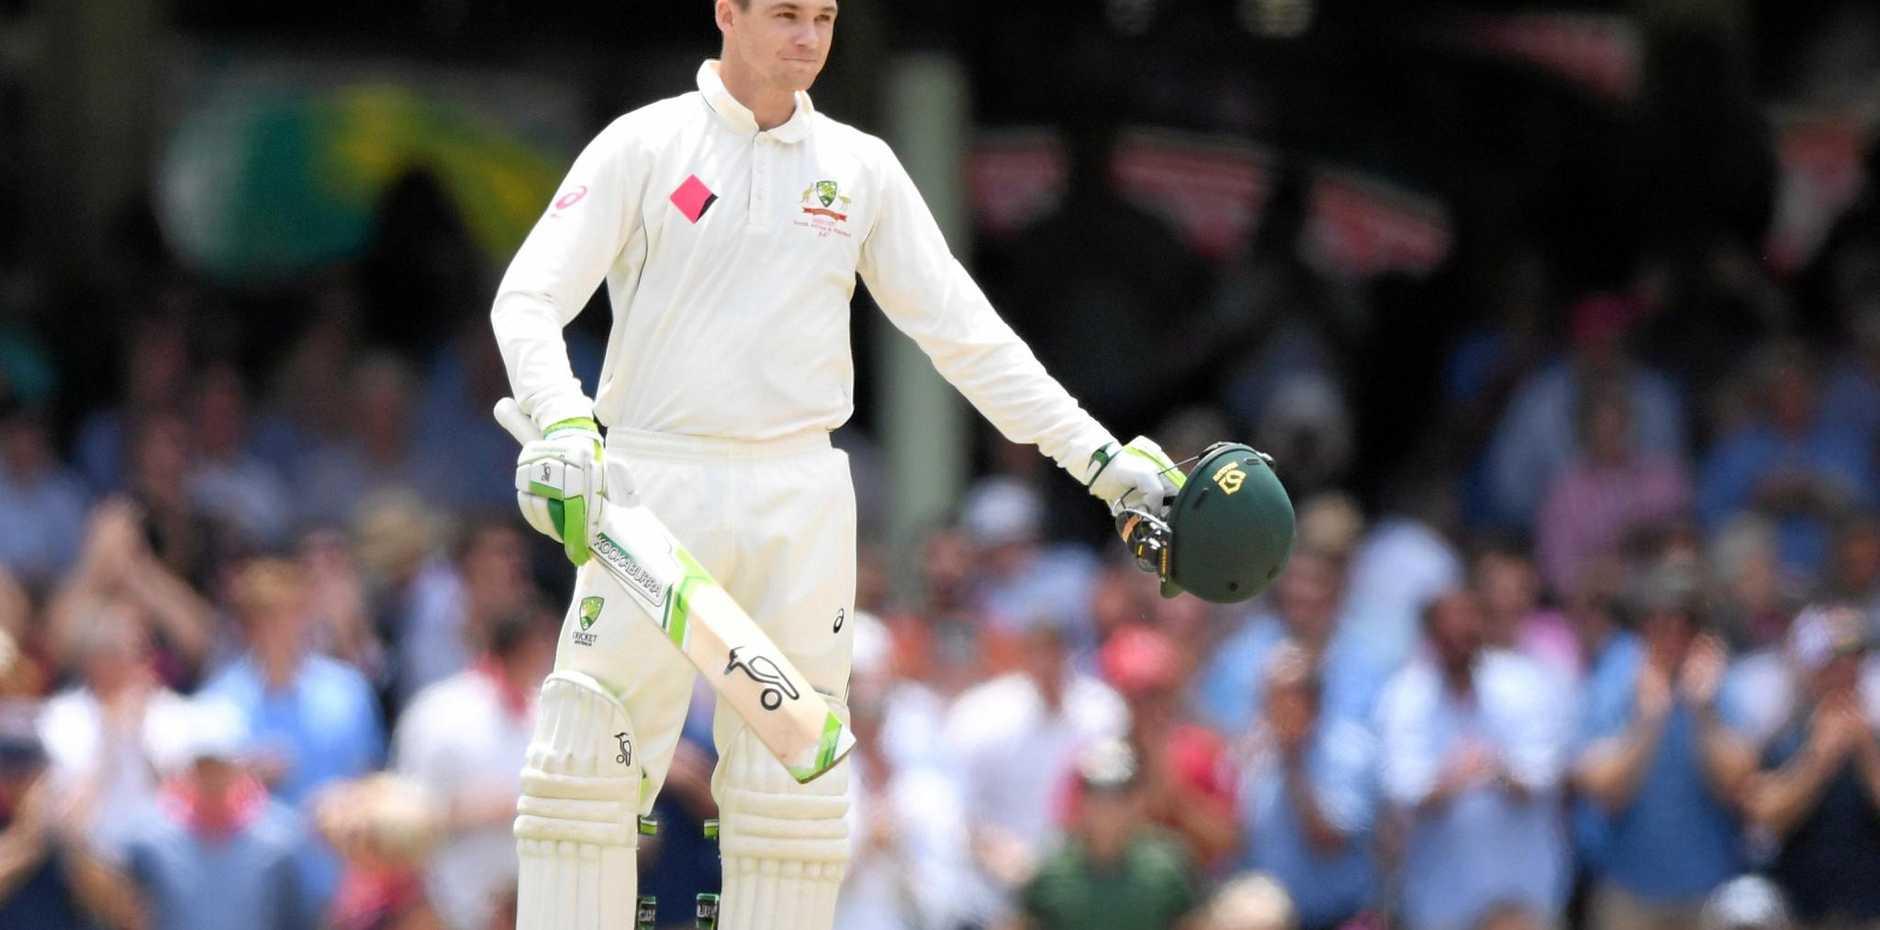 Peter Handscomb has been a form player for Australia.